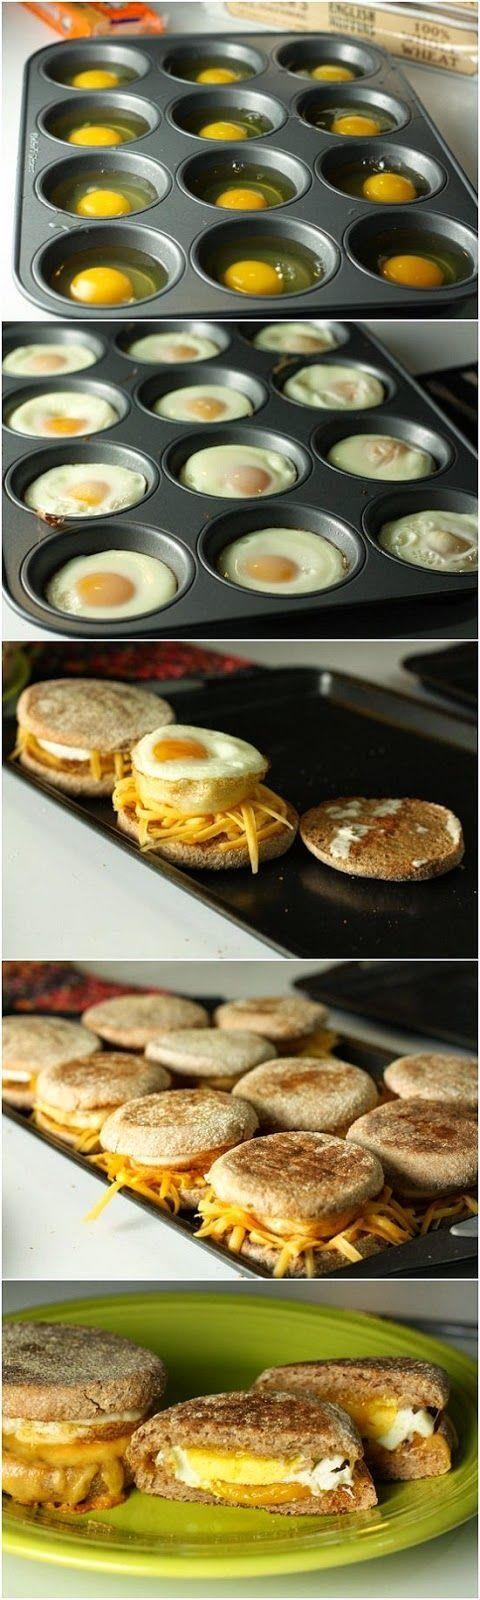 11 Brilliant Egg Hacks That Will Change Your Mornings Forever